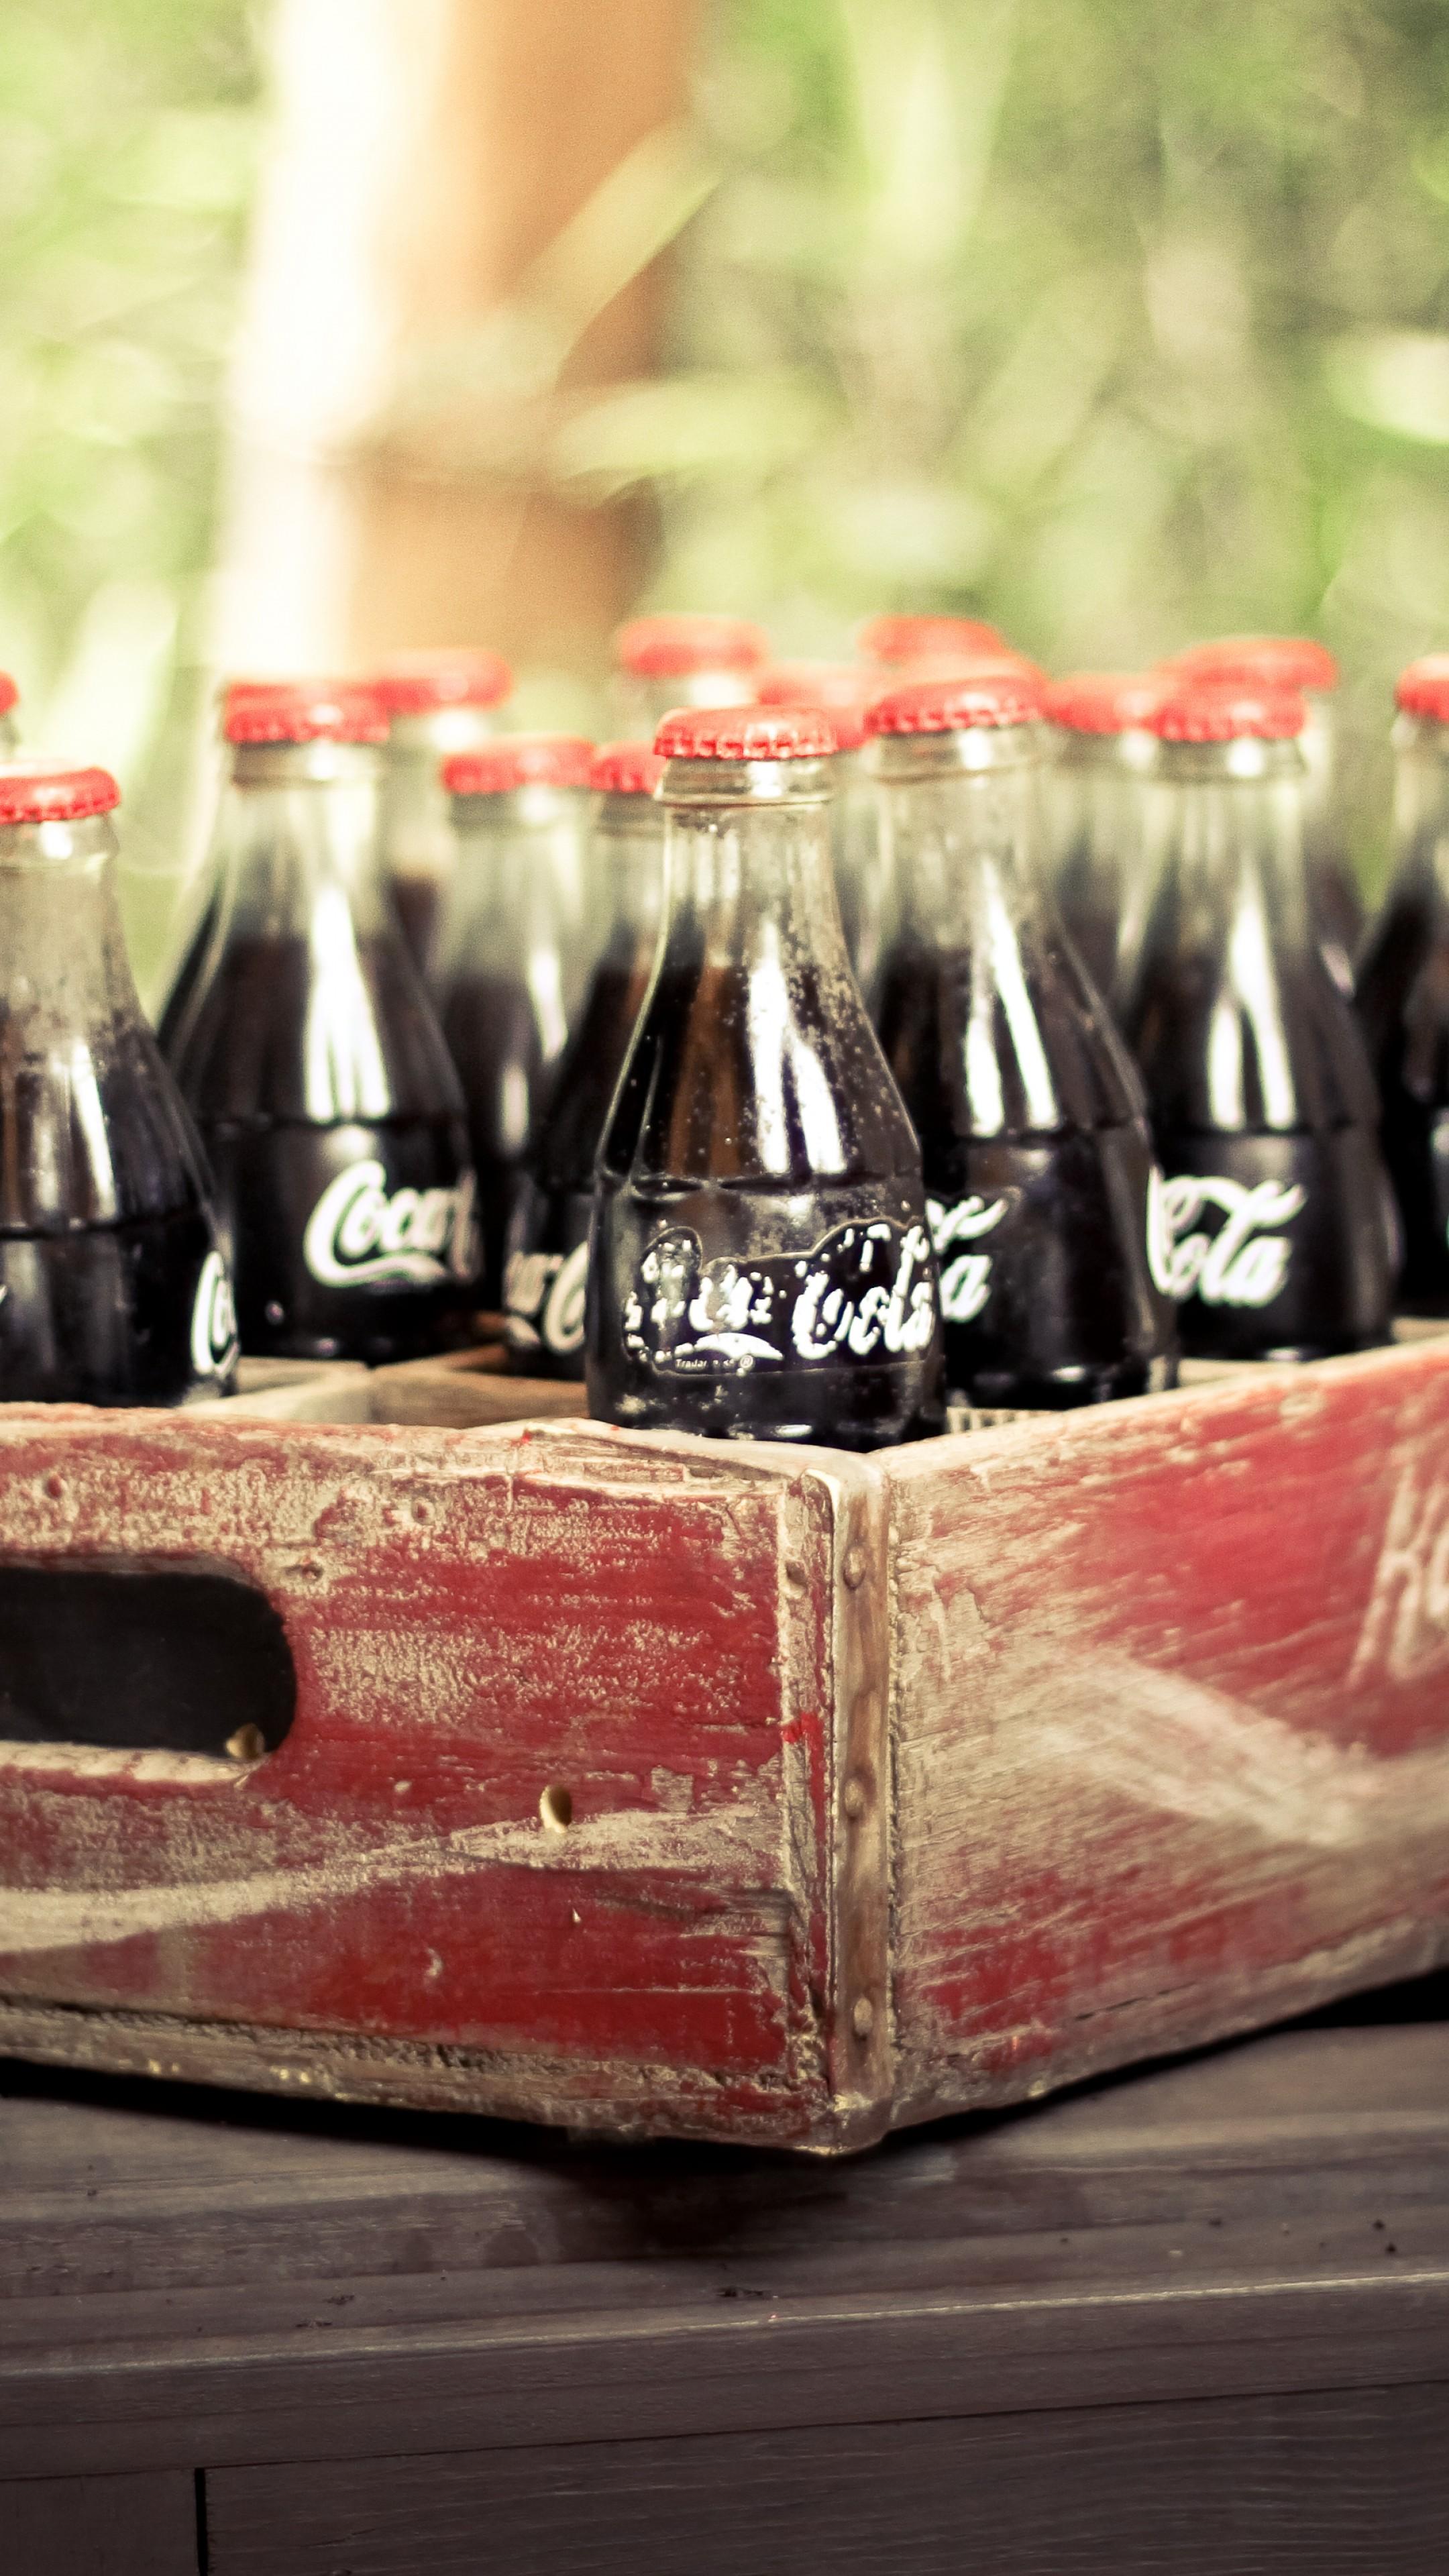 4k Christmas Wallpaper Iphone X Wallpaper Coca Cola Drink Soda Box Vintage Retro